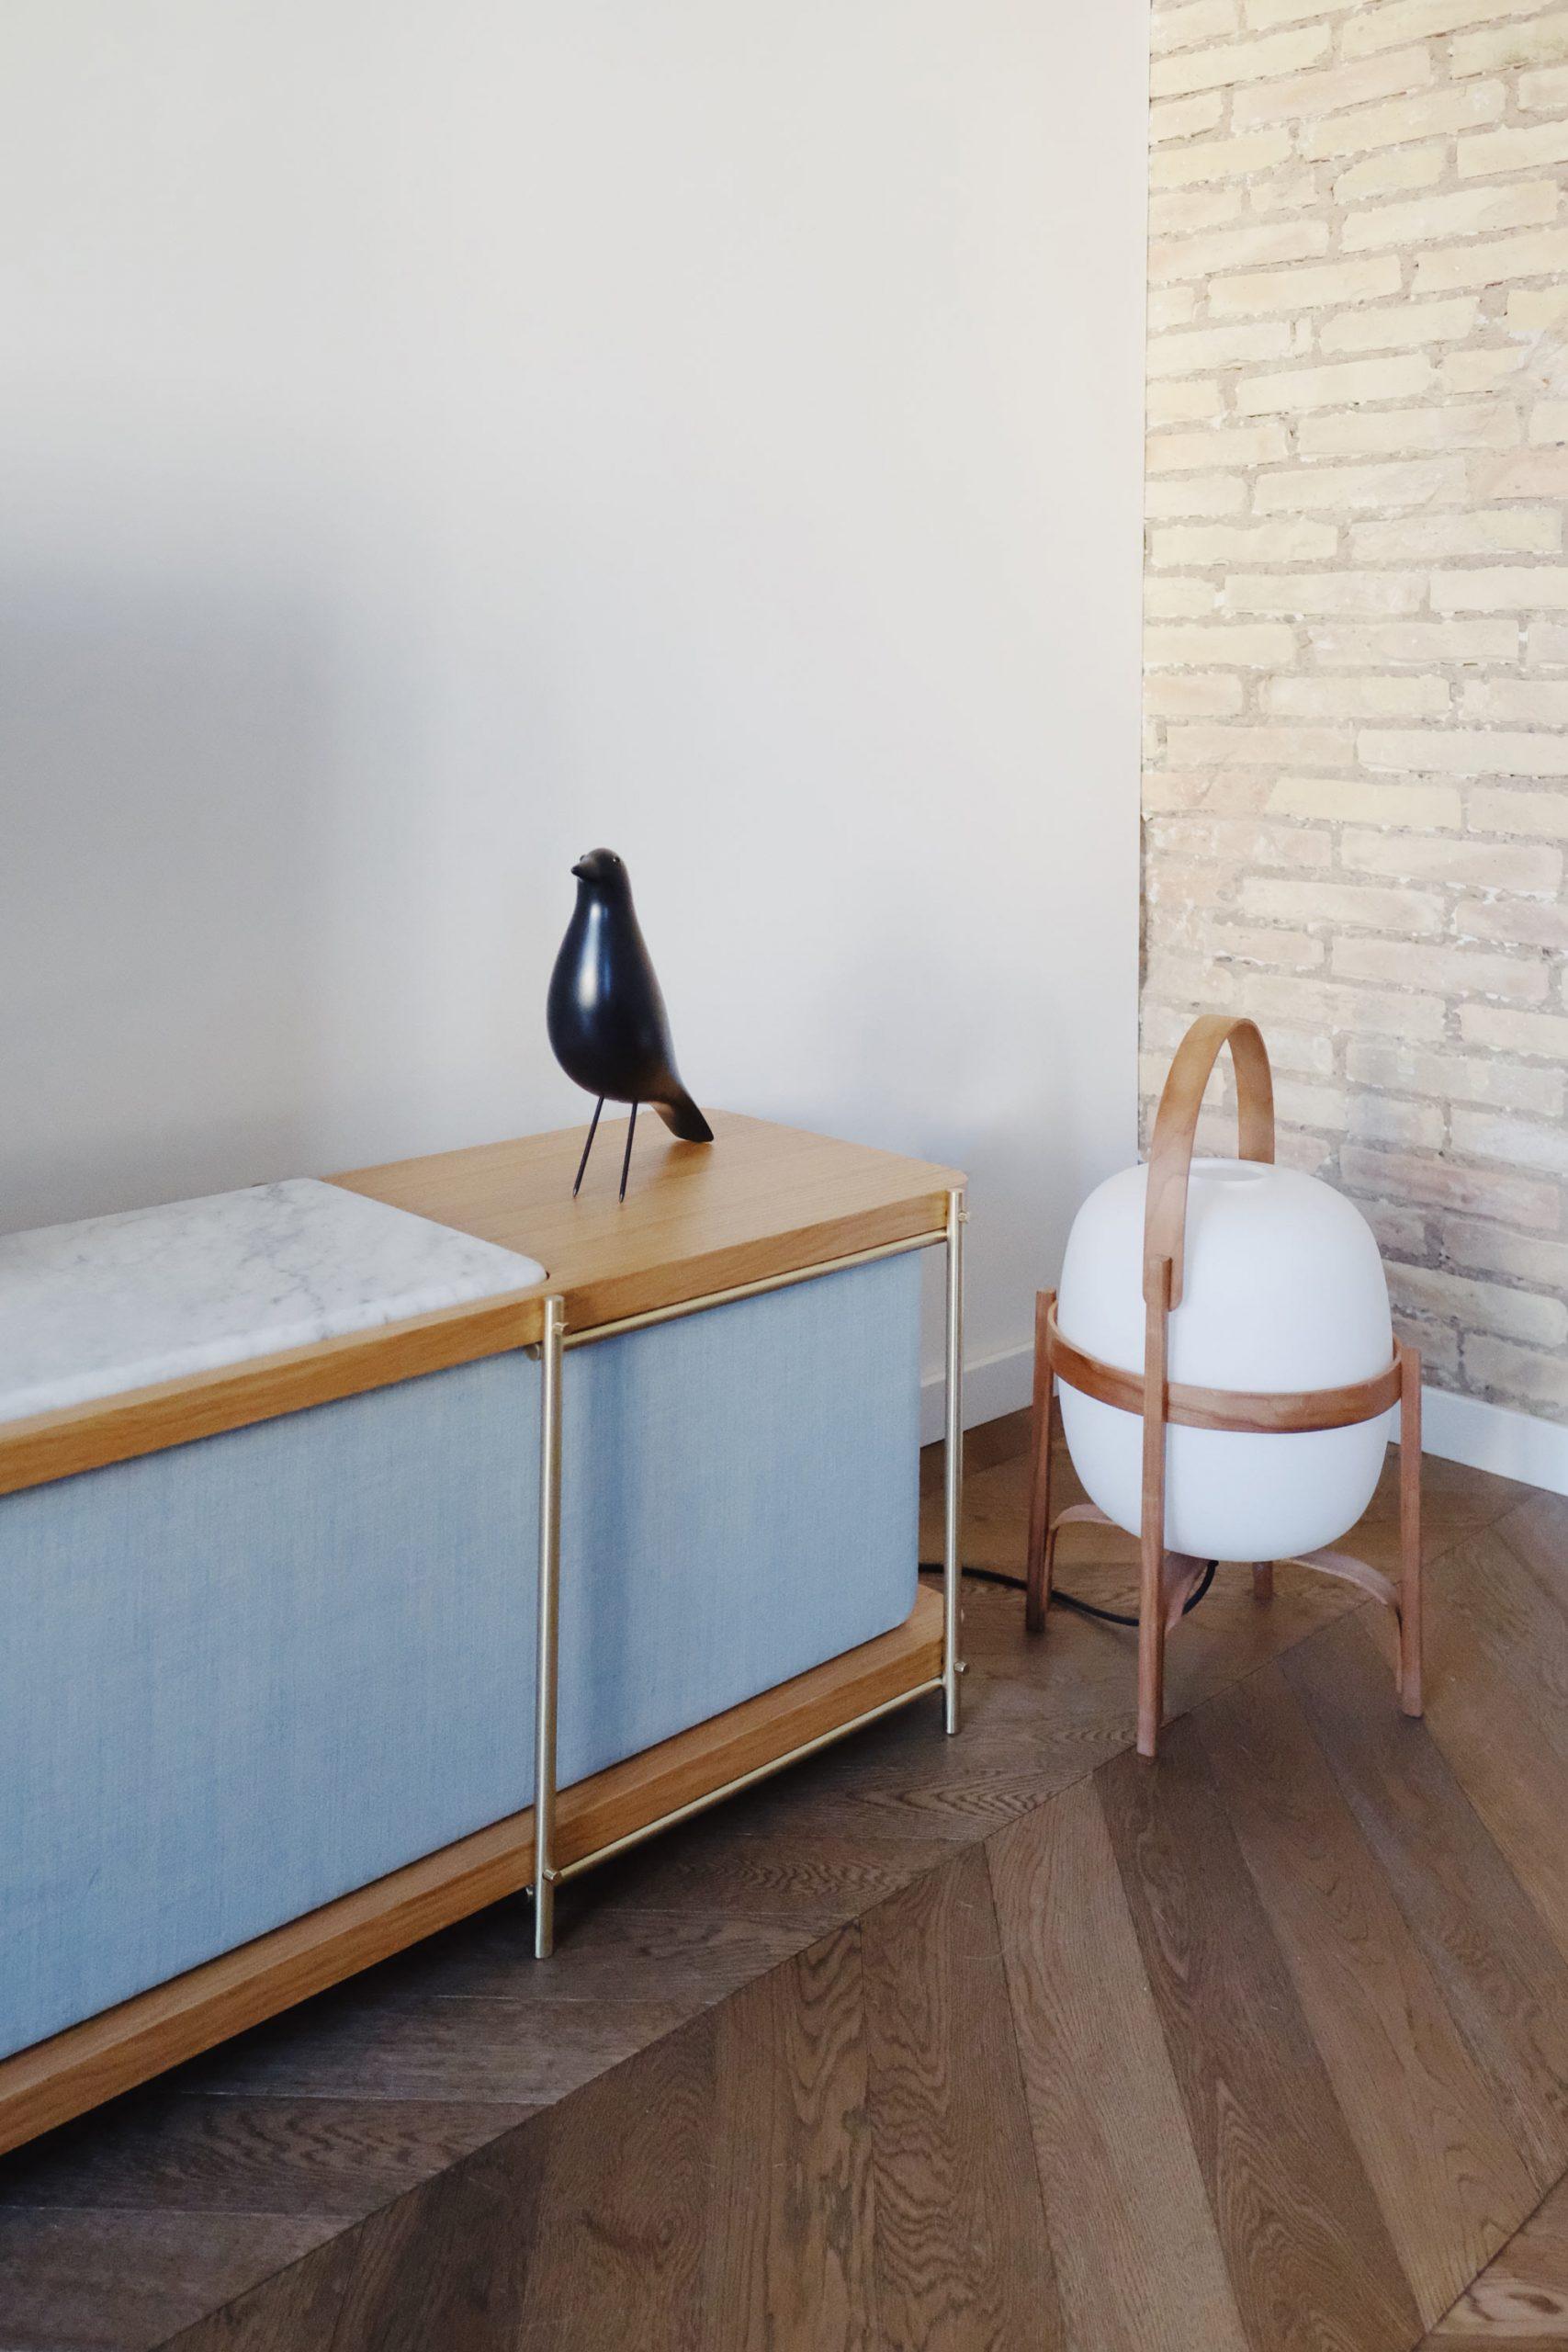 Julia by Momocca, Bauhaus style interior design